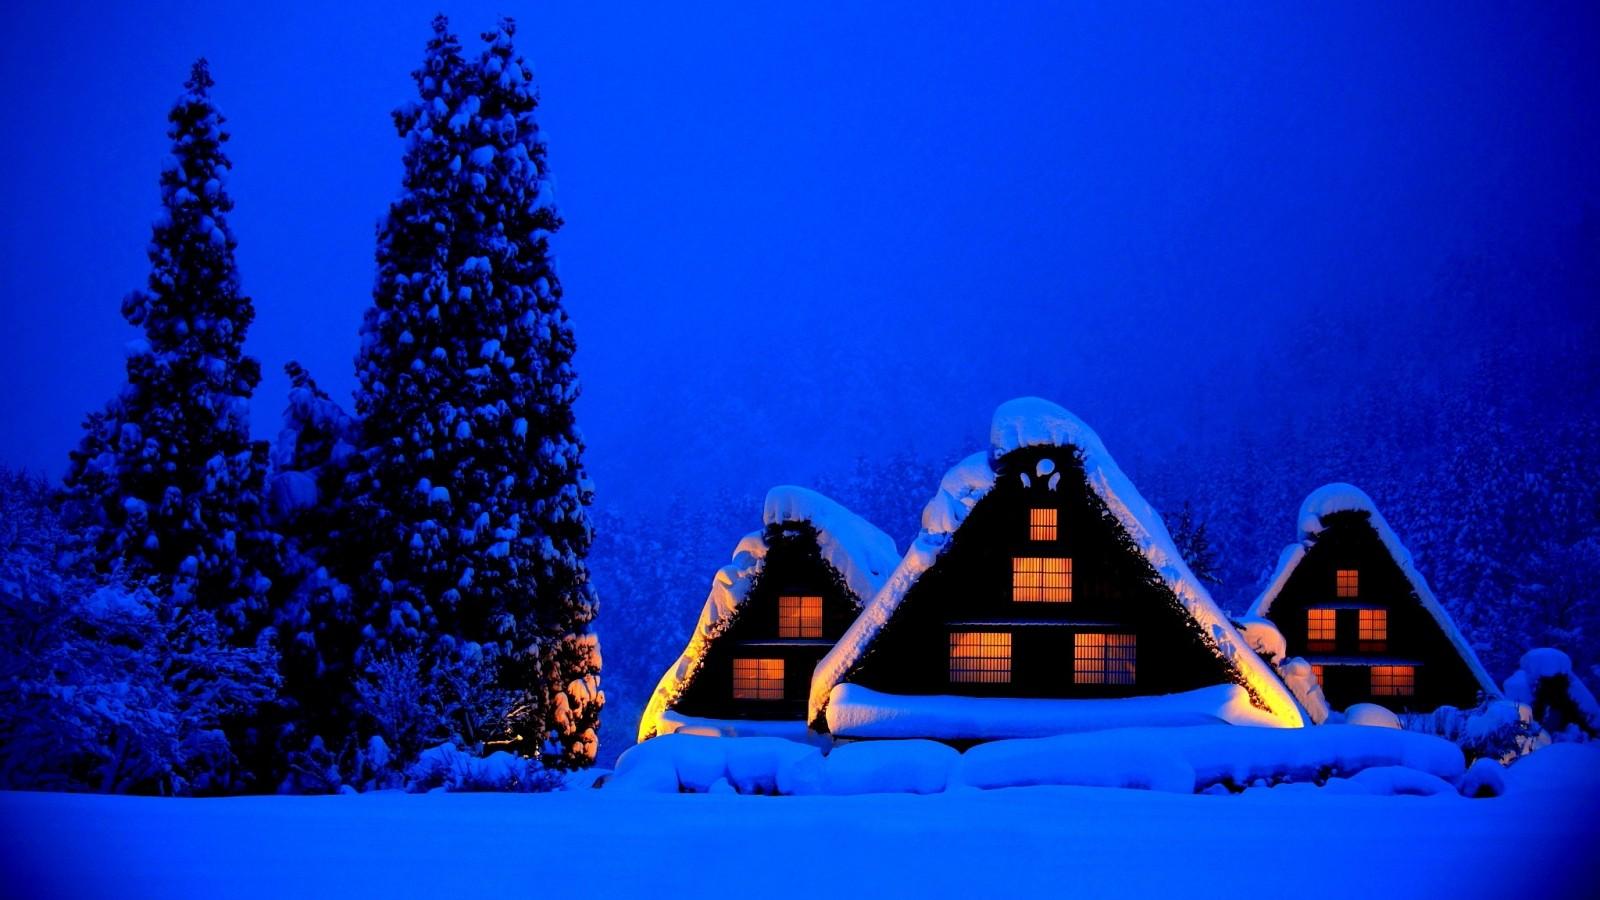 priroda-dom-zima-sneg-nebo.jpg